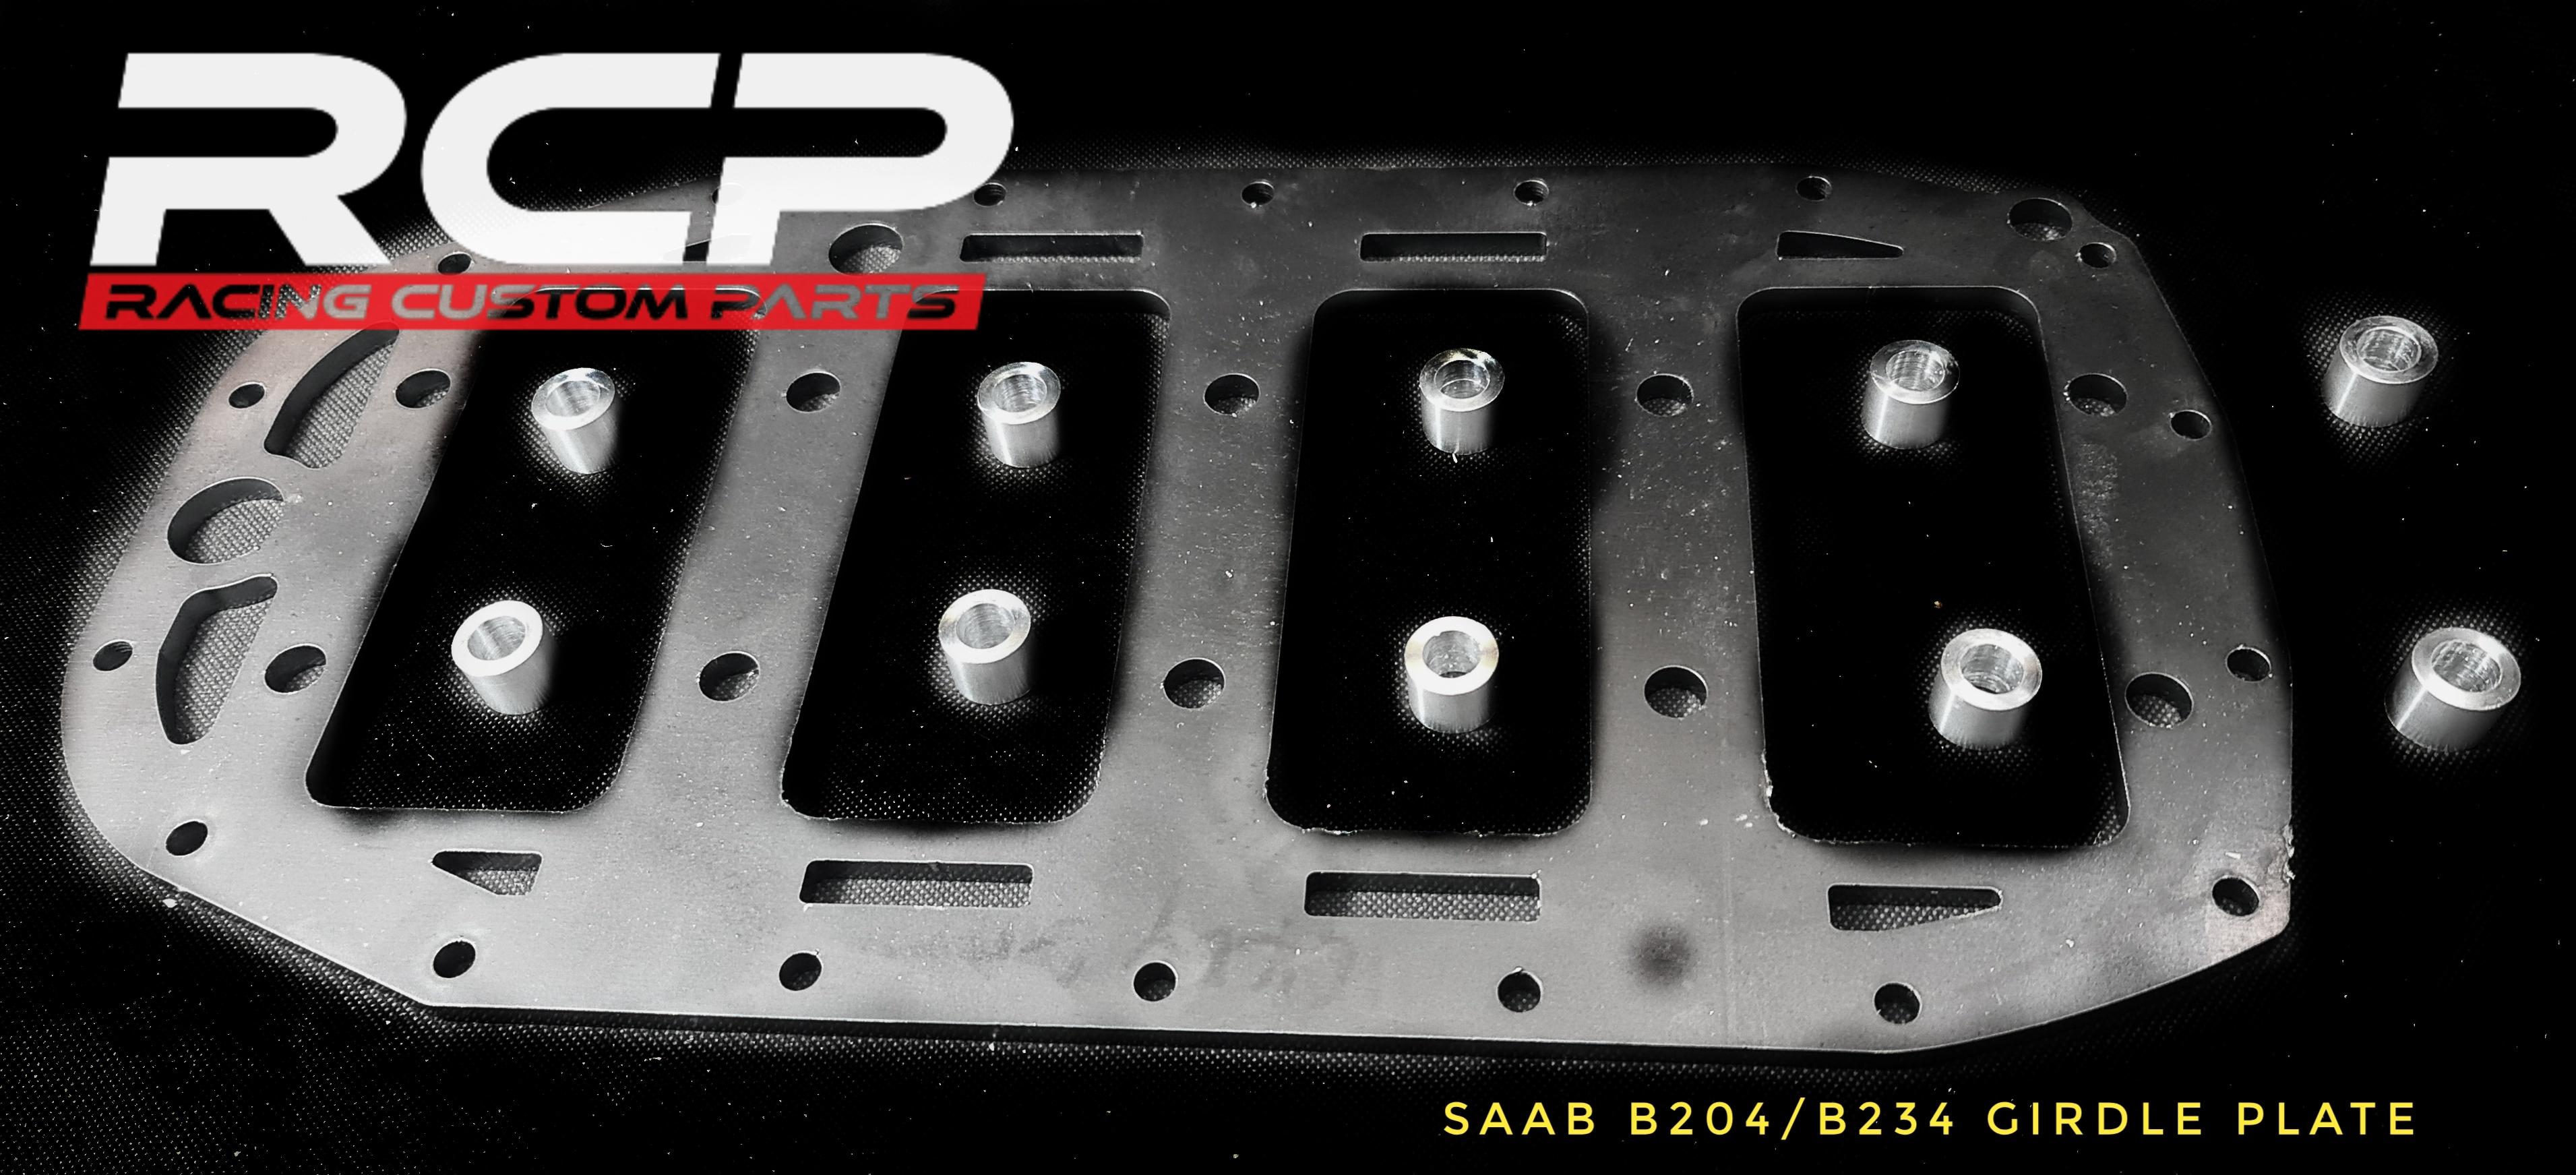 saab b204 b234 girdleplate griddle plate girdle plate turbo tuning maincaps saabpower rcp racingcustomparts